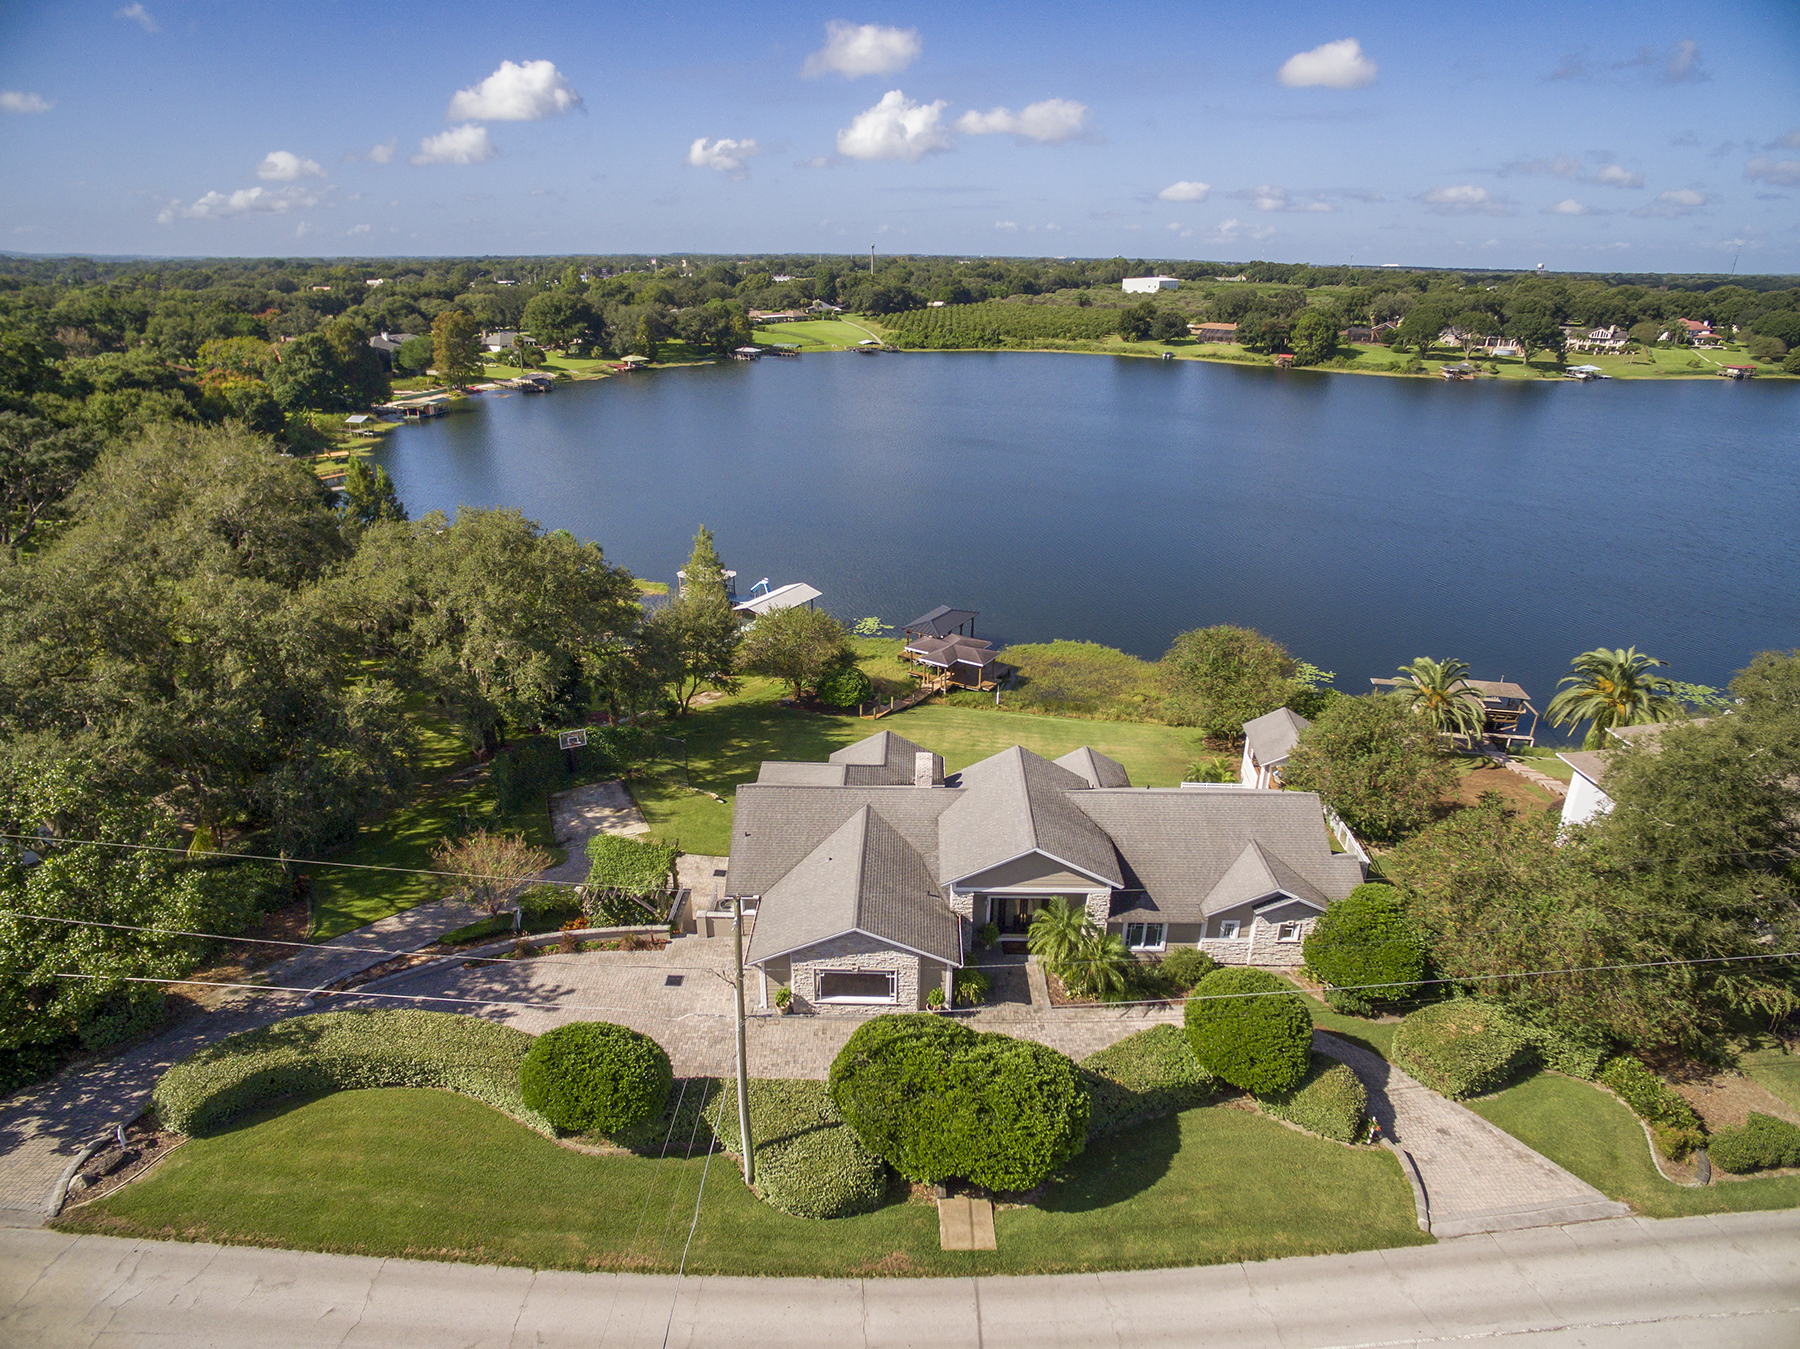 Villa per Vendita alle ore ORLANDO - EUSTIS 2790 E Crooked Lake Dr Eustis, Florida, 32726 Stati Uniti